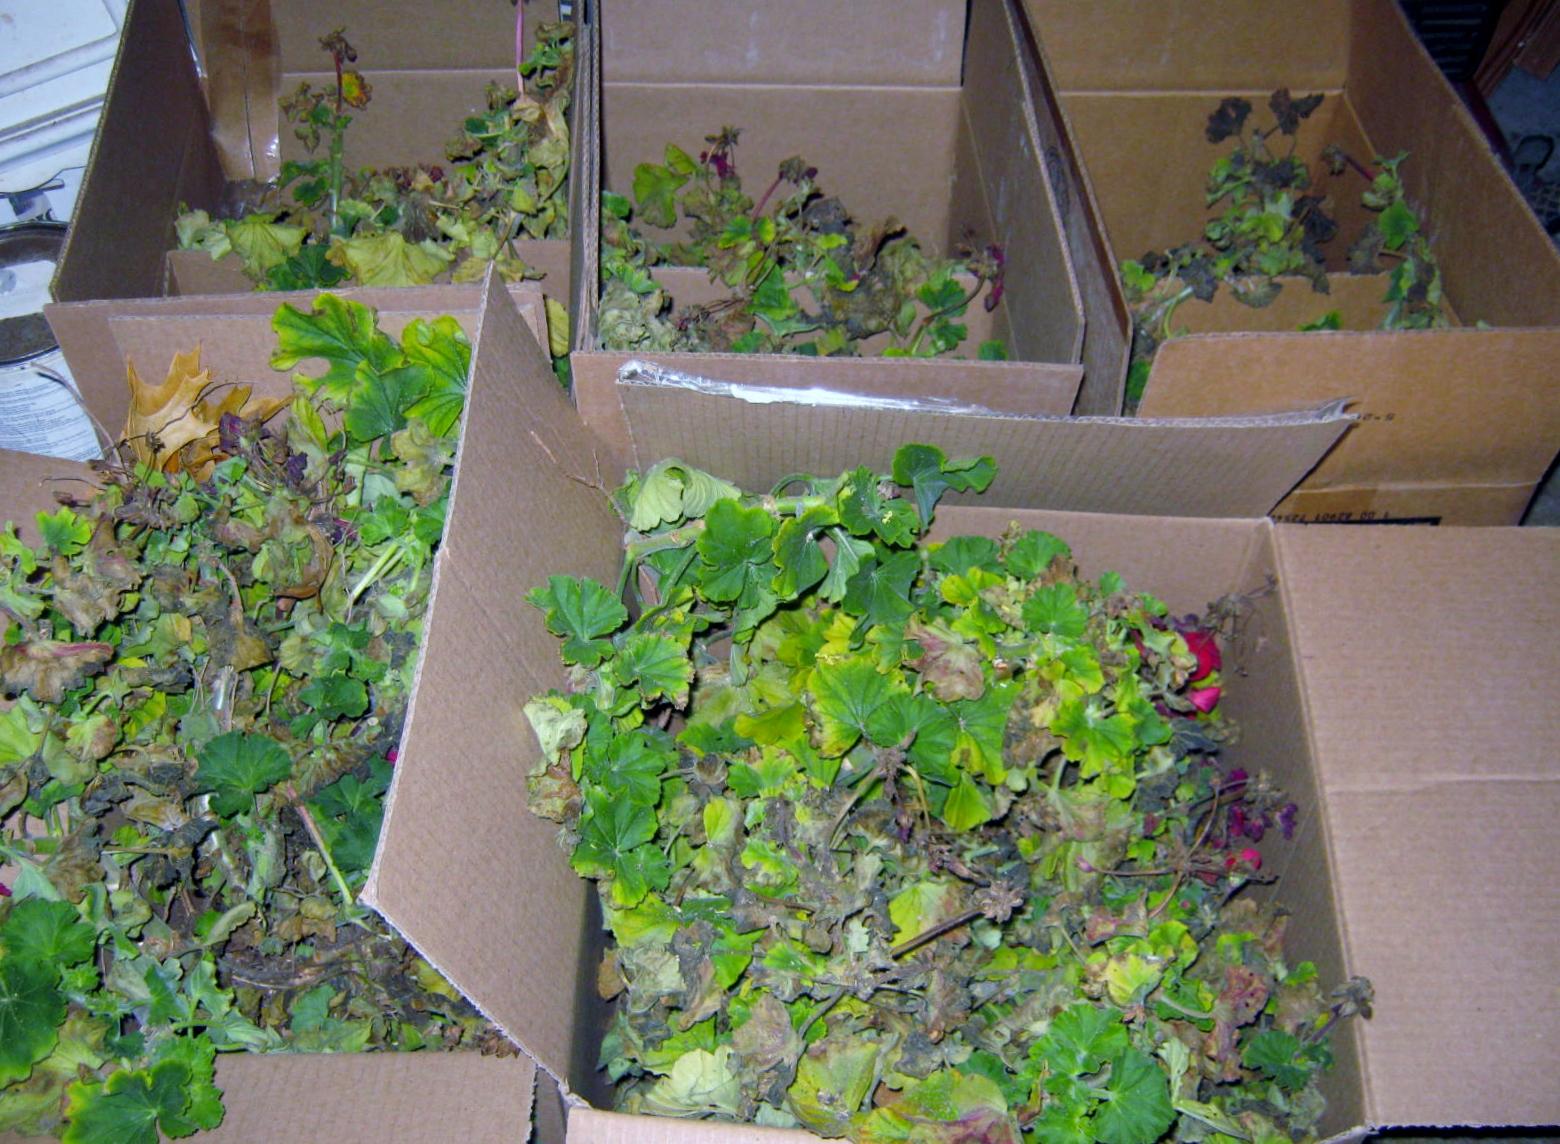 Quick tip plants over wintering geraniums minding my p 39 s with q - Overwintering geraniums tips ...